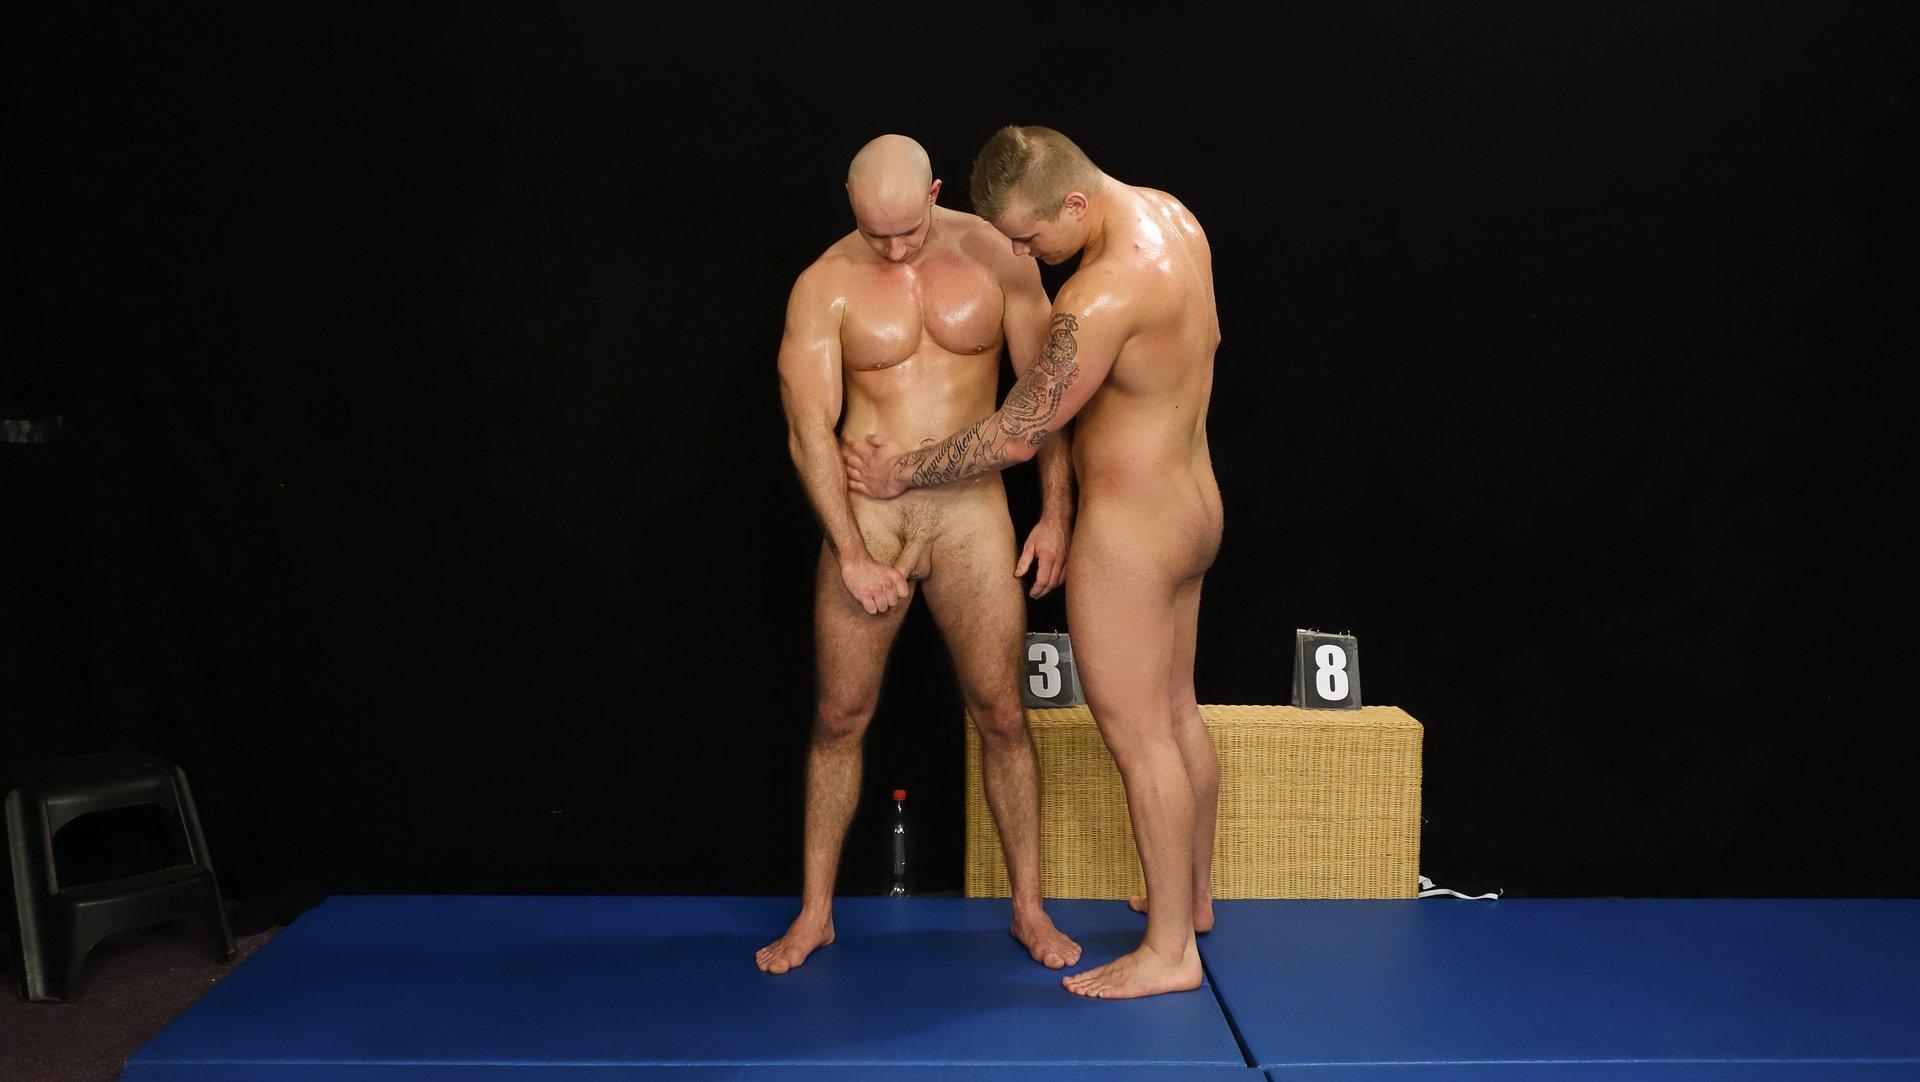 Photo number 3 from Jindra vs Marek - WRESTLING shot for swnude on Kink.com. Featuring Jindra Durak and Marek Borek in hardcore BDSM & Fetish porn.